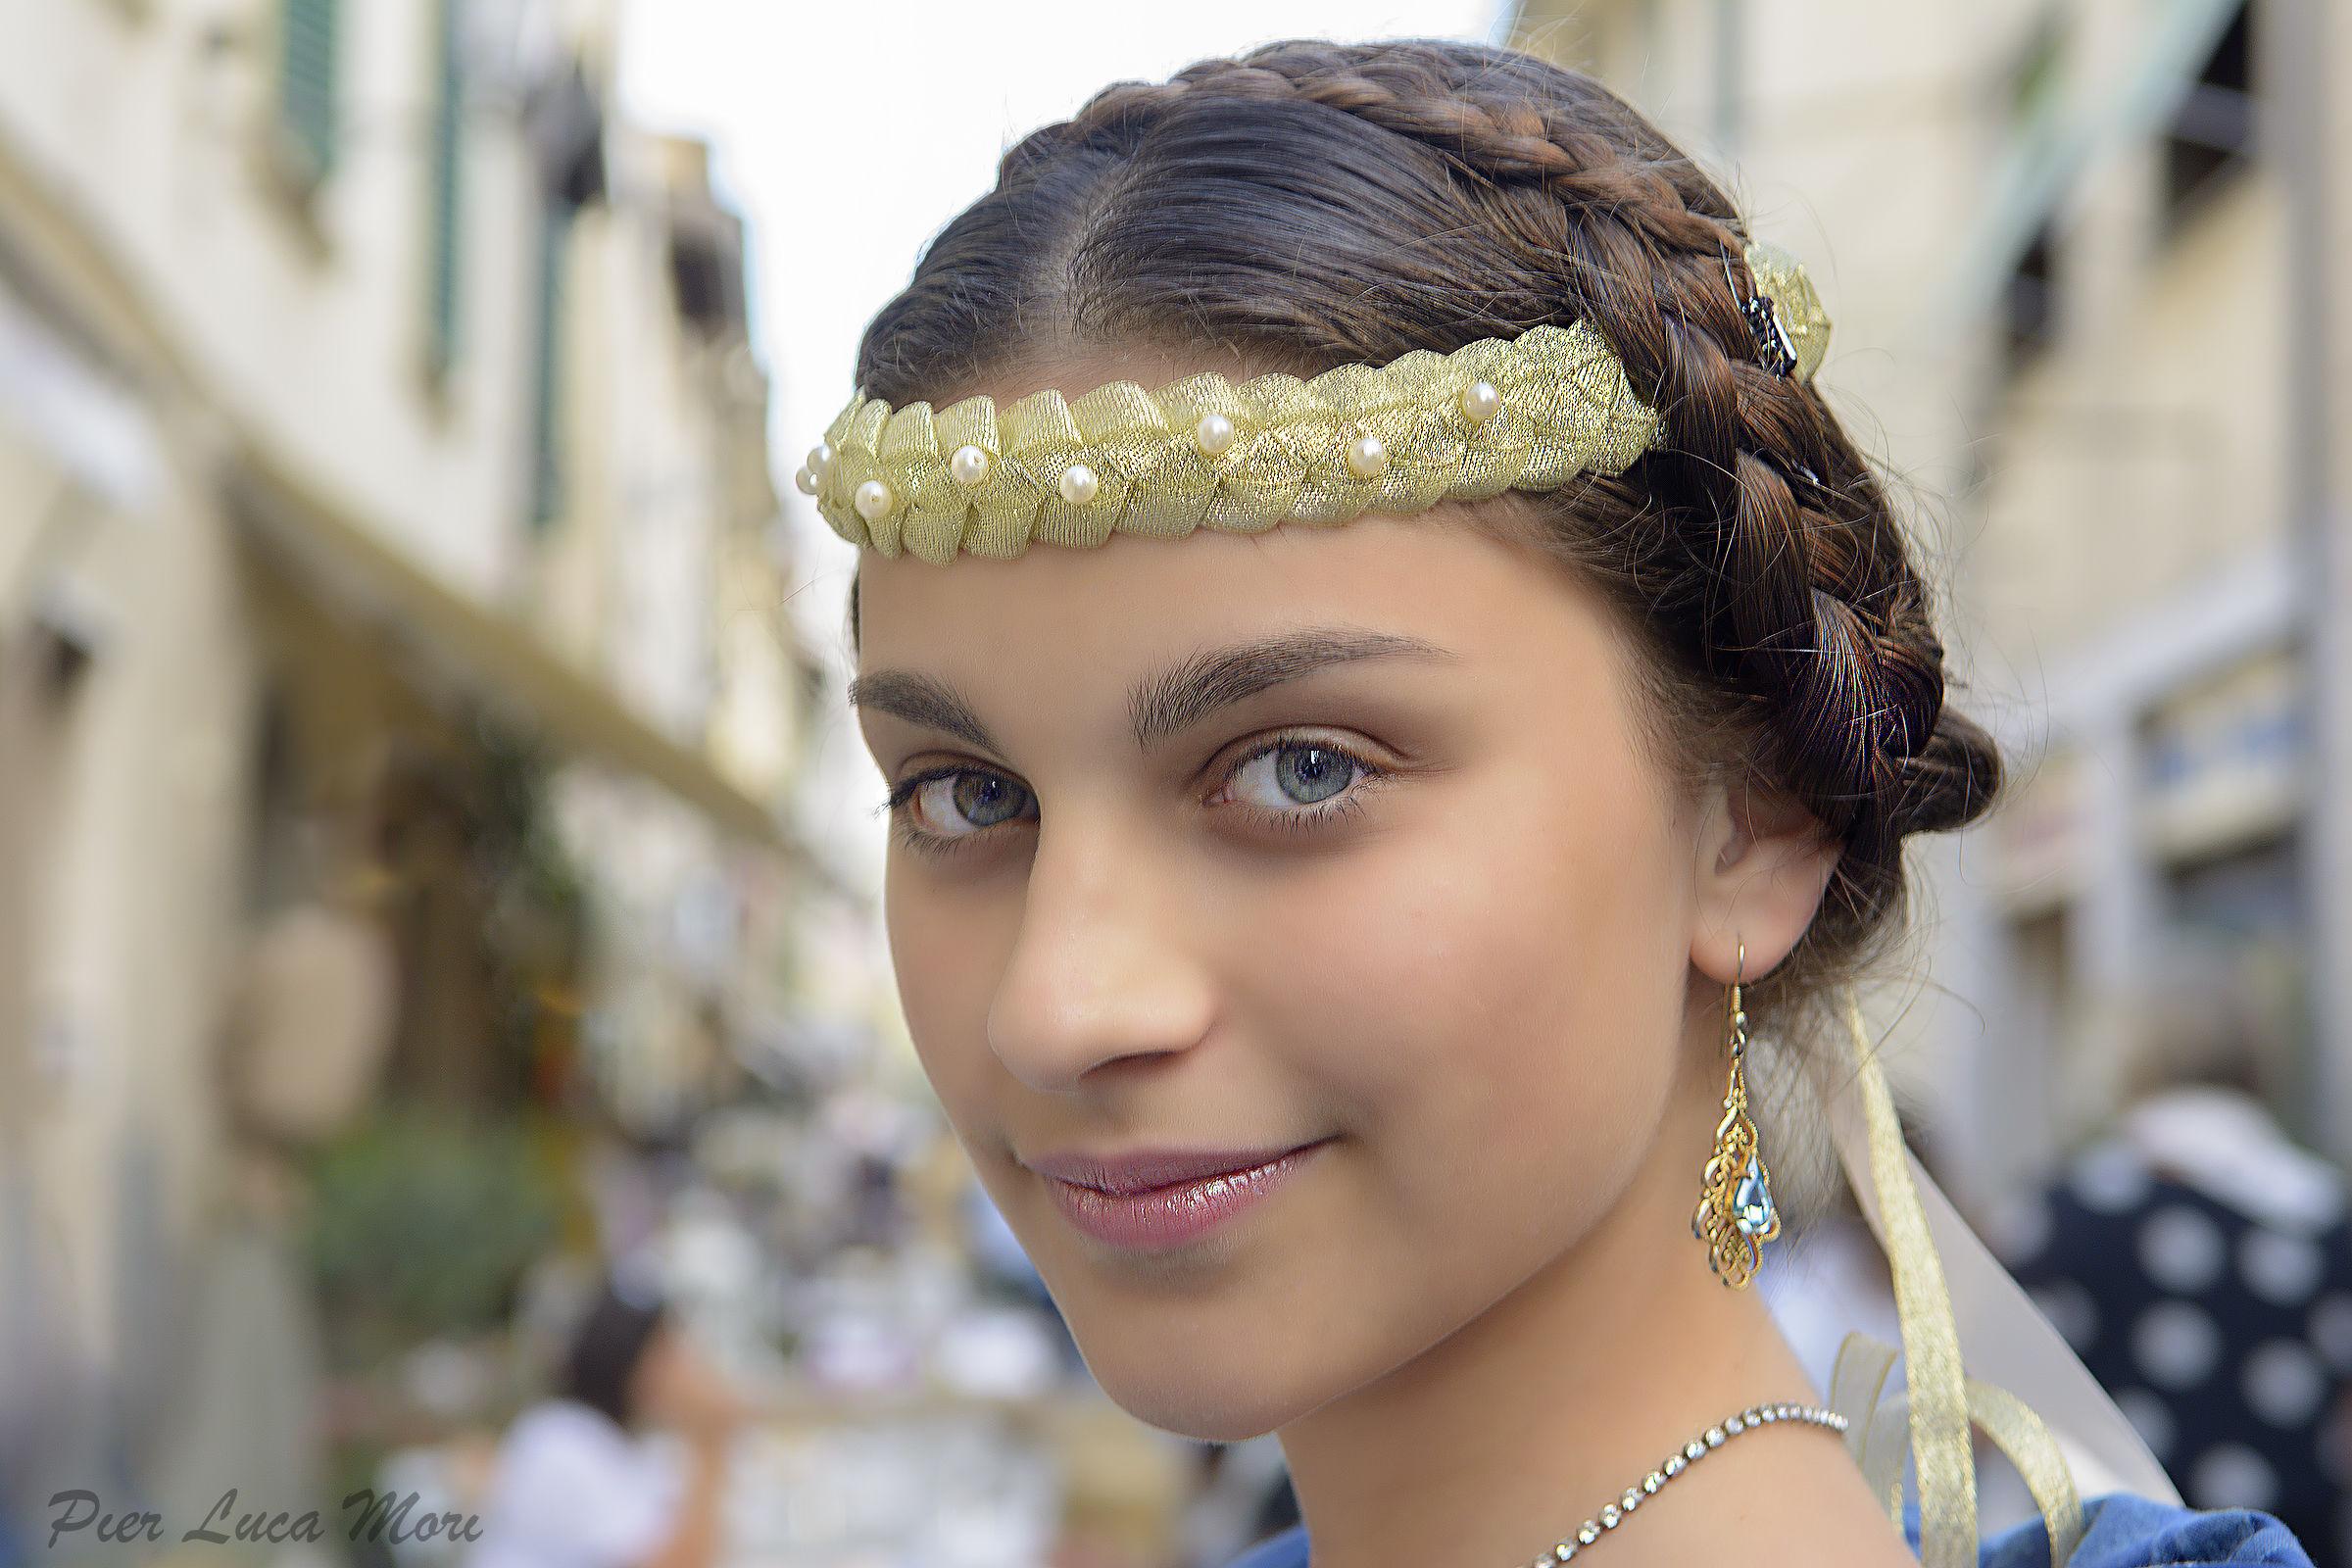 The beautiful courtesan 2...